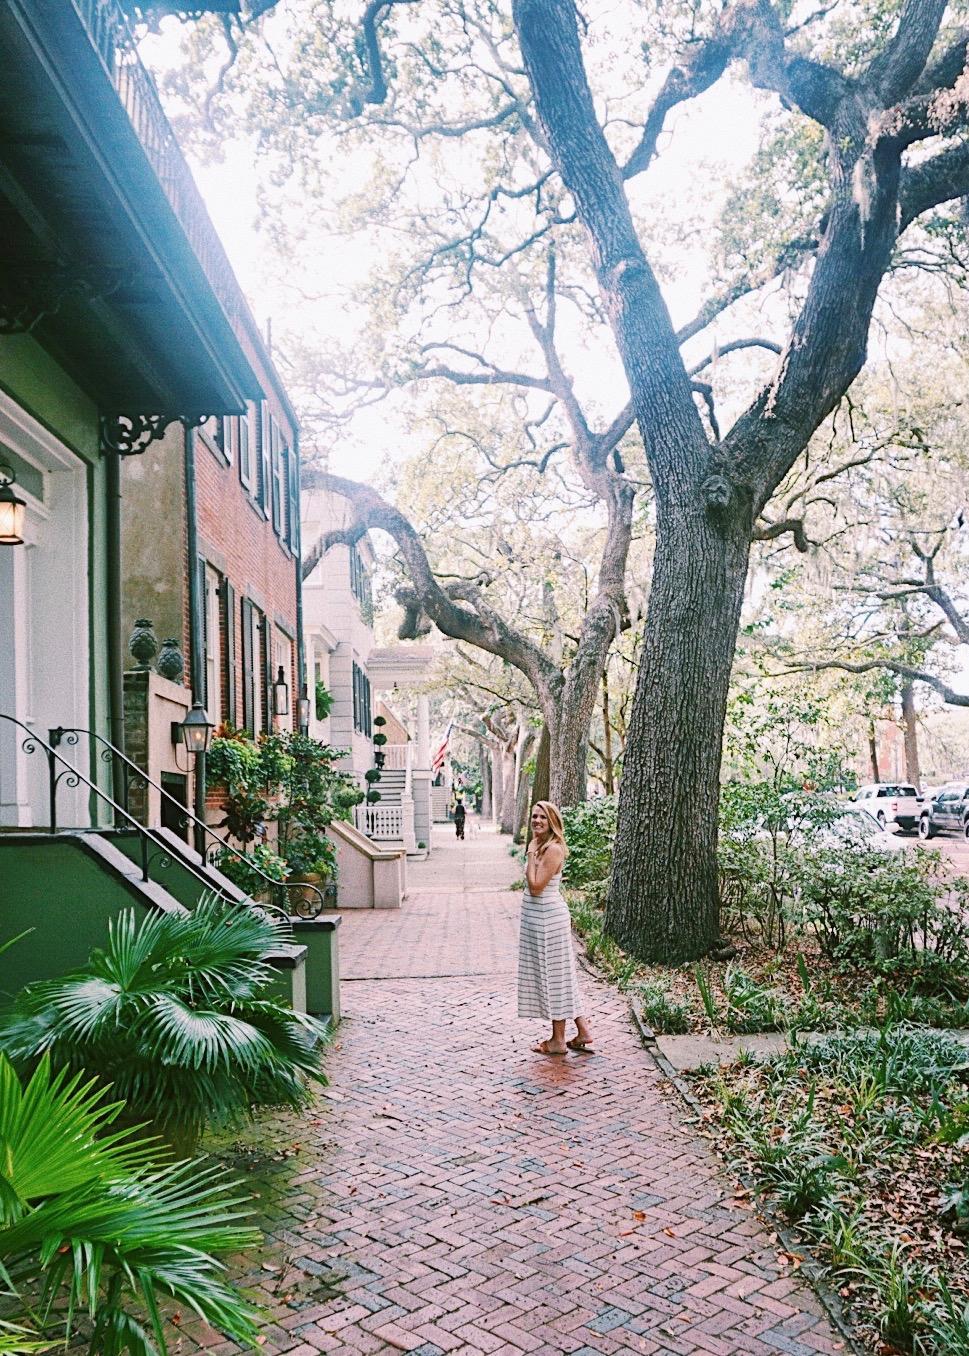 Jones Street, Savannah Georgia